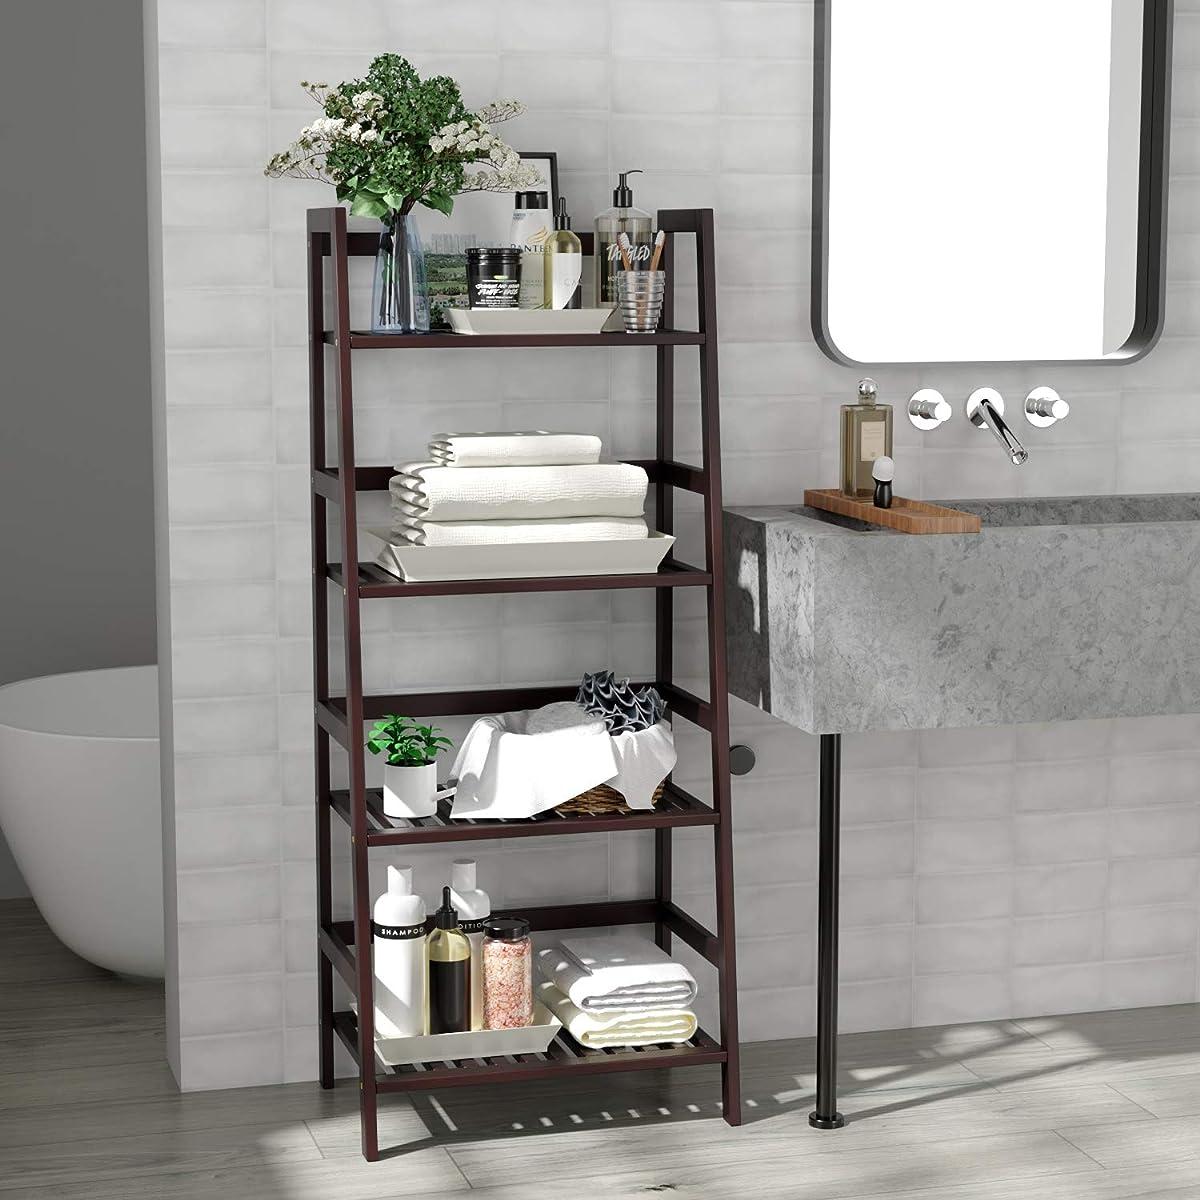 Homfa Bamboo 4 Shelf Bookcase, Multifunctional Ladder Shaped Plant Flower Stand Rack Bookrack Storage Shelves, Retro Color